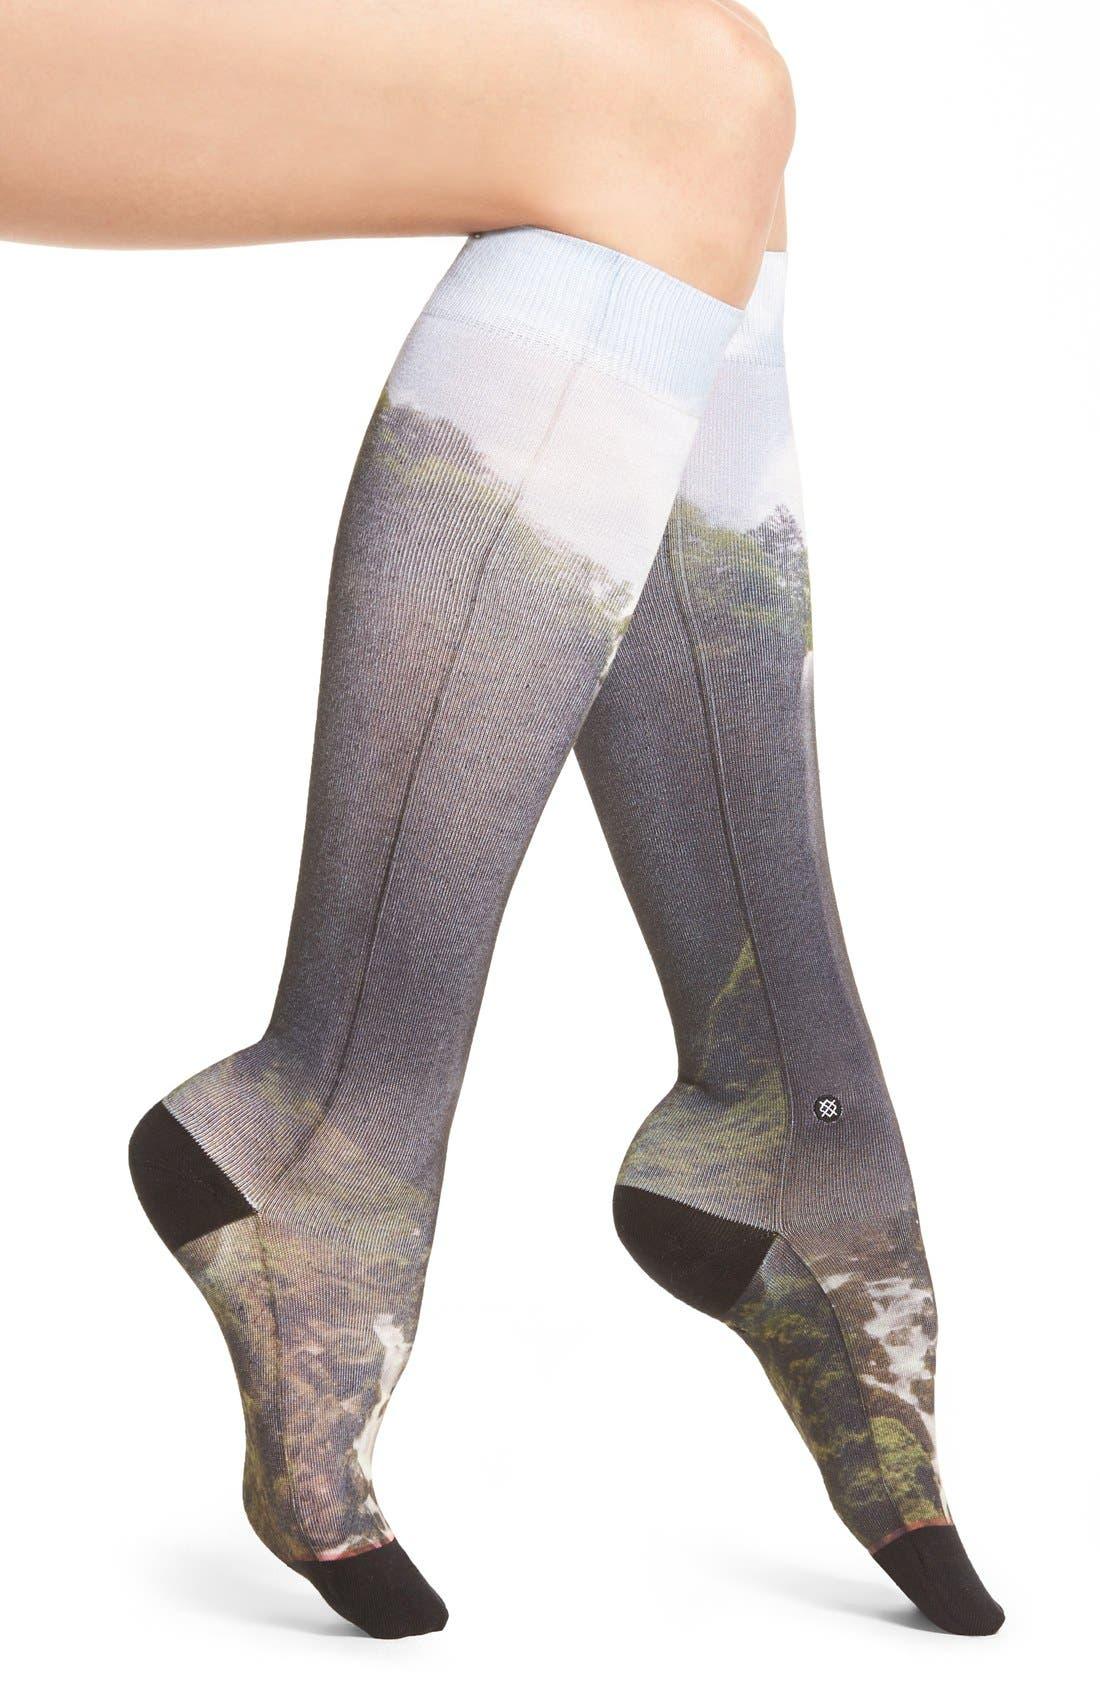 Alternate Image 1 Selected - Stance Earth Vs. Cosmo Knee Socks